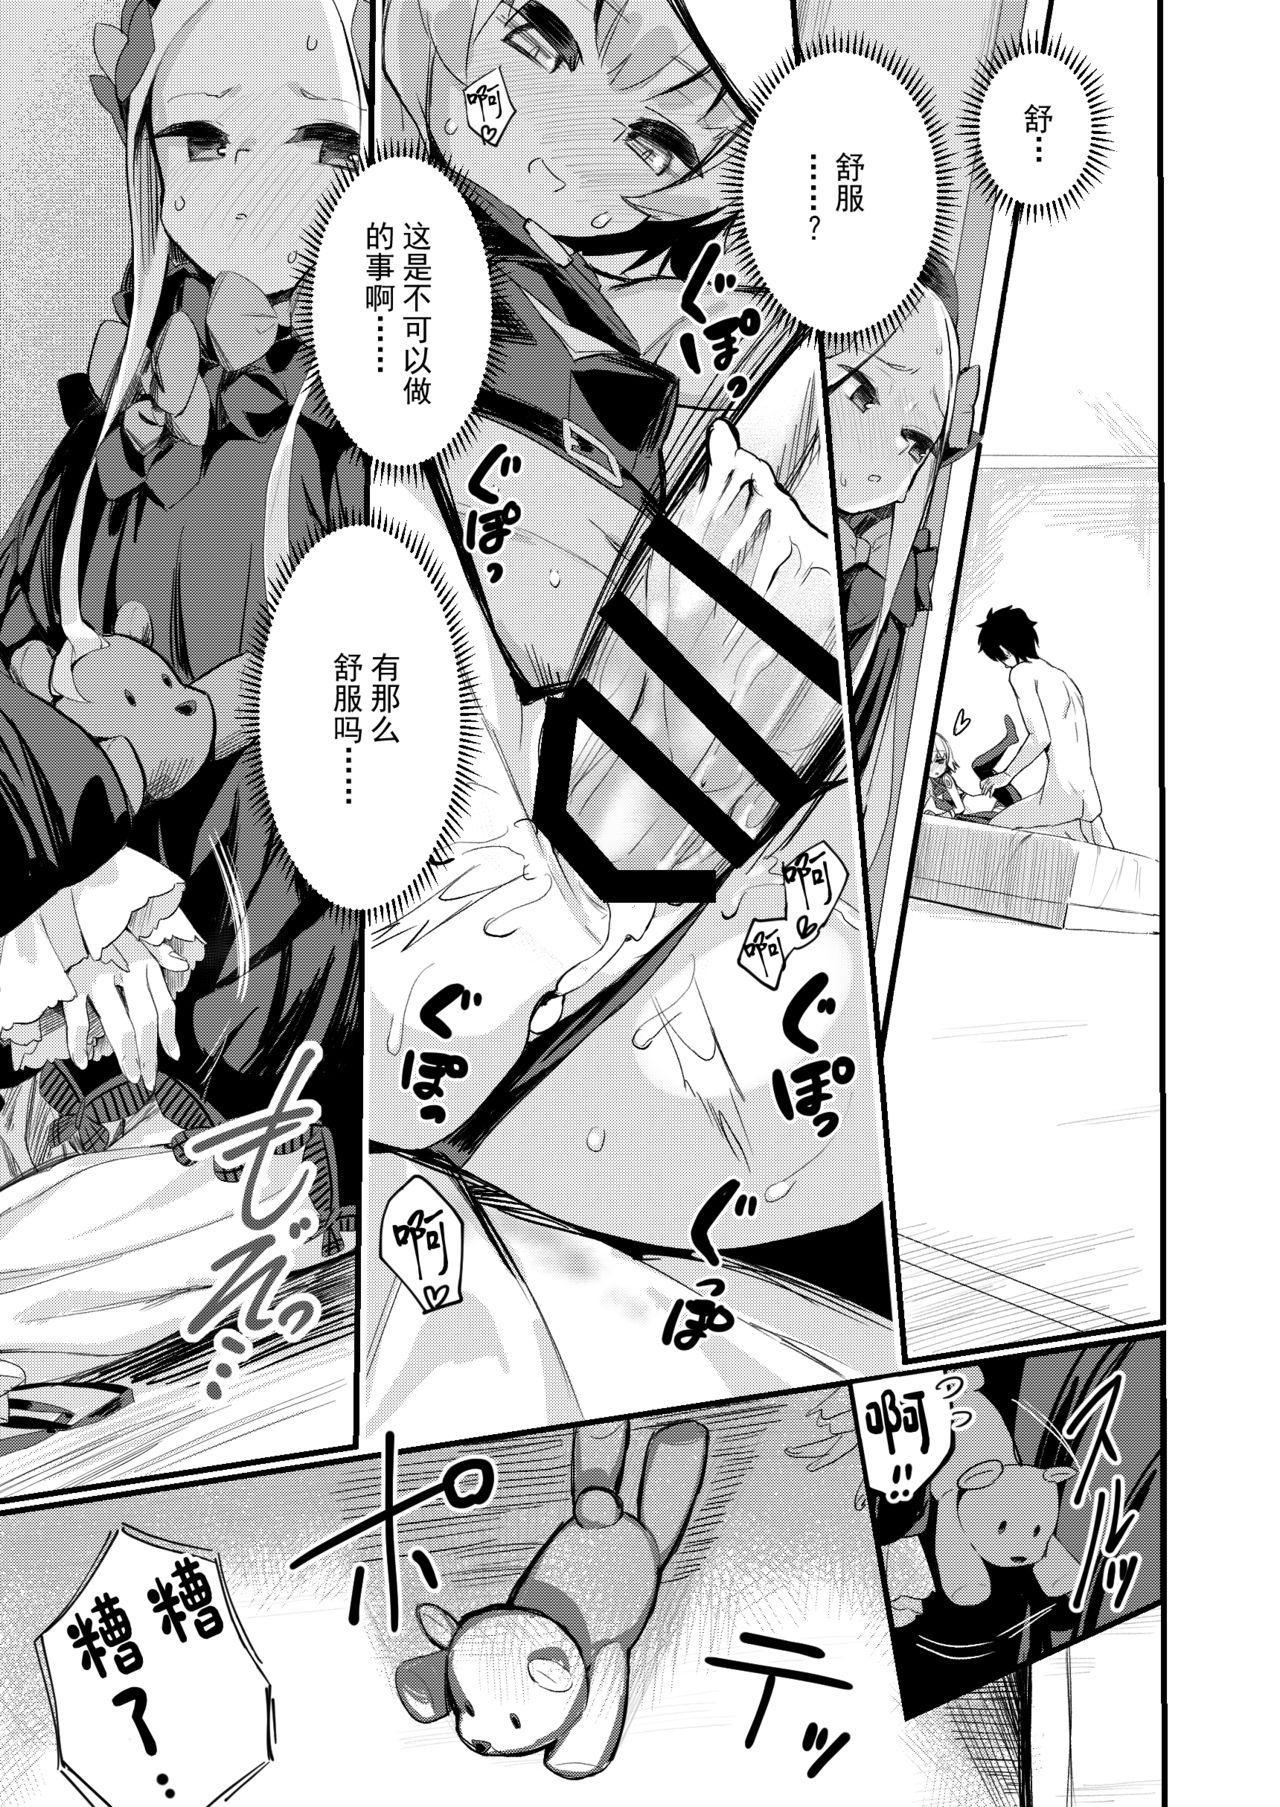 Ikenai Koto ja Nai kara 4